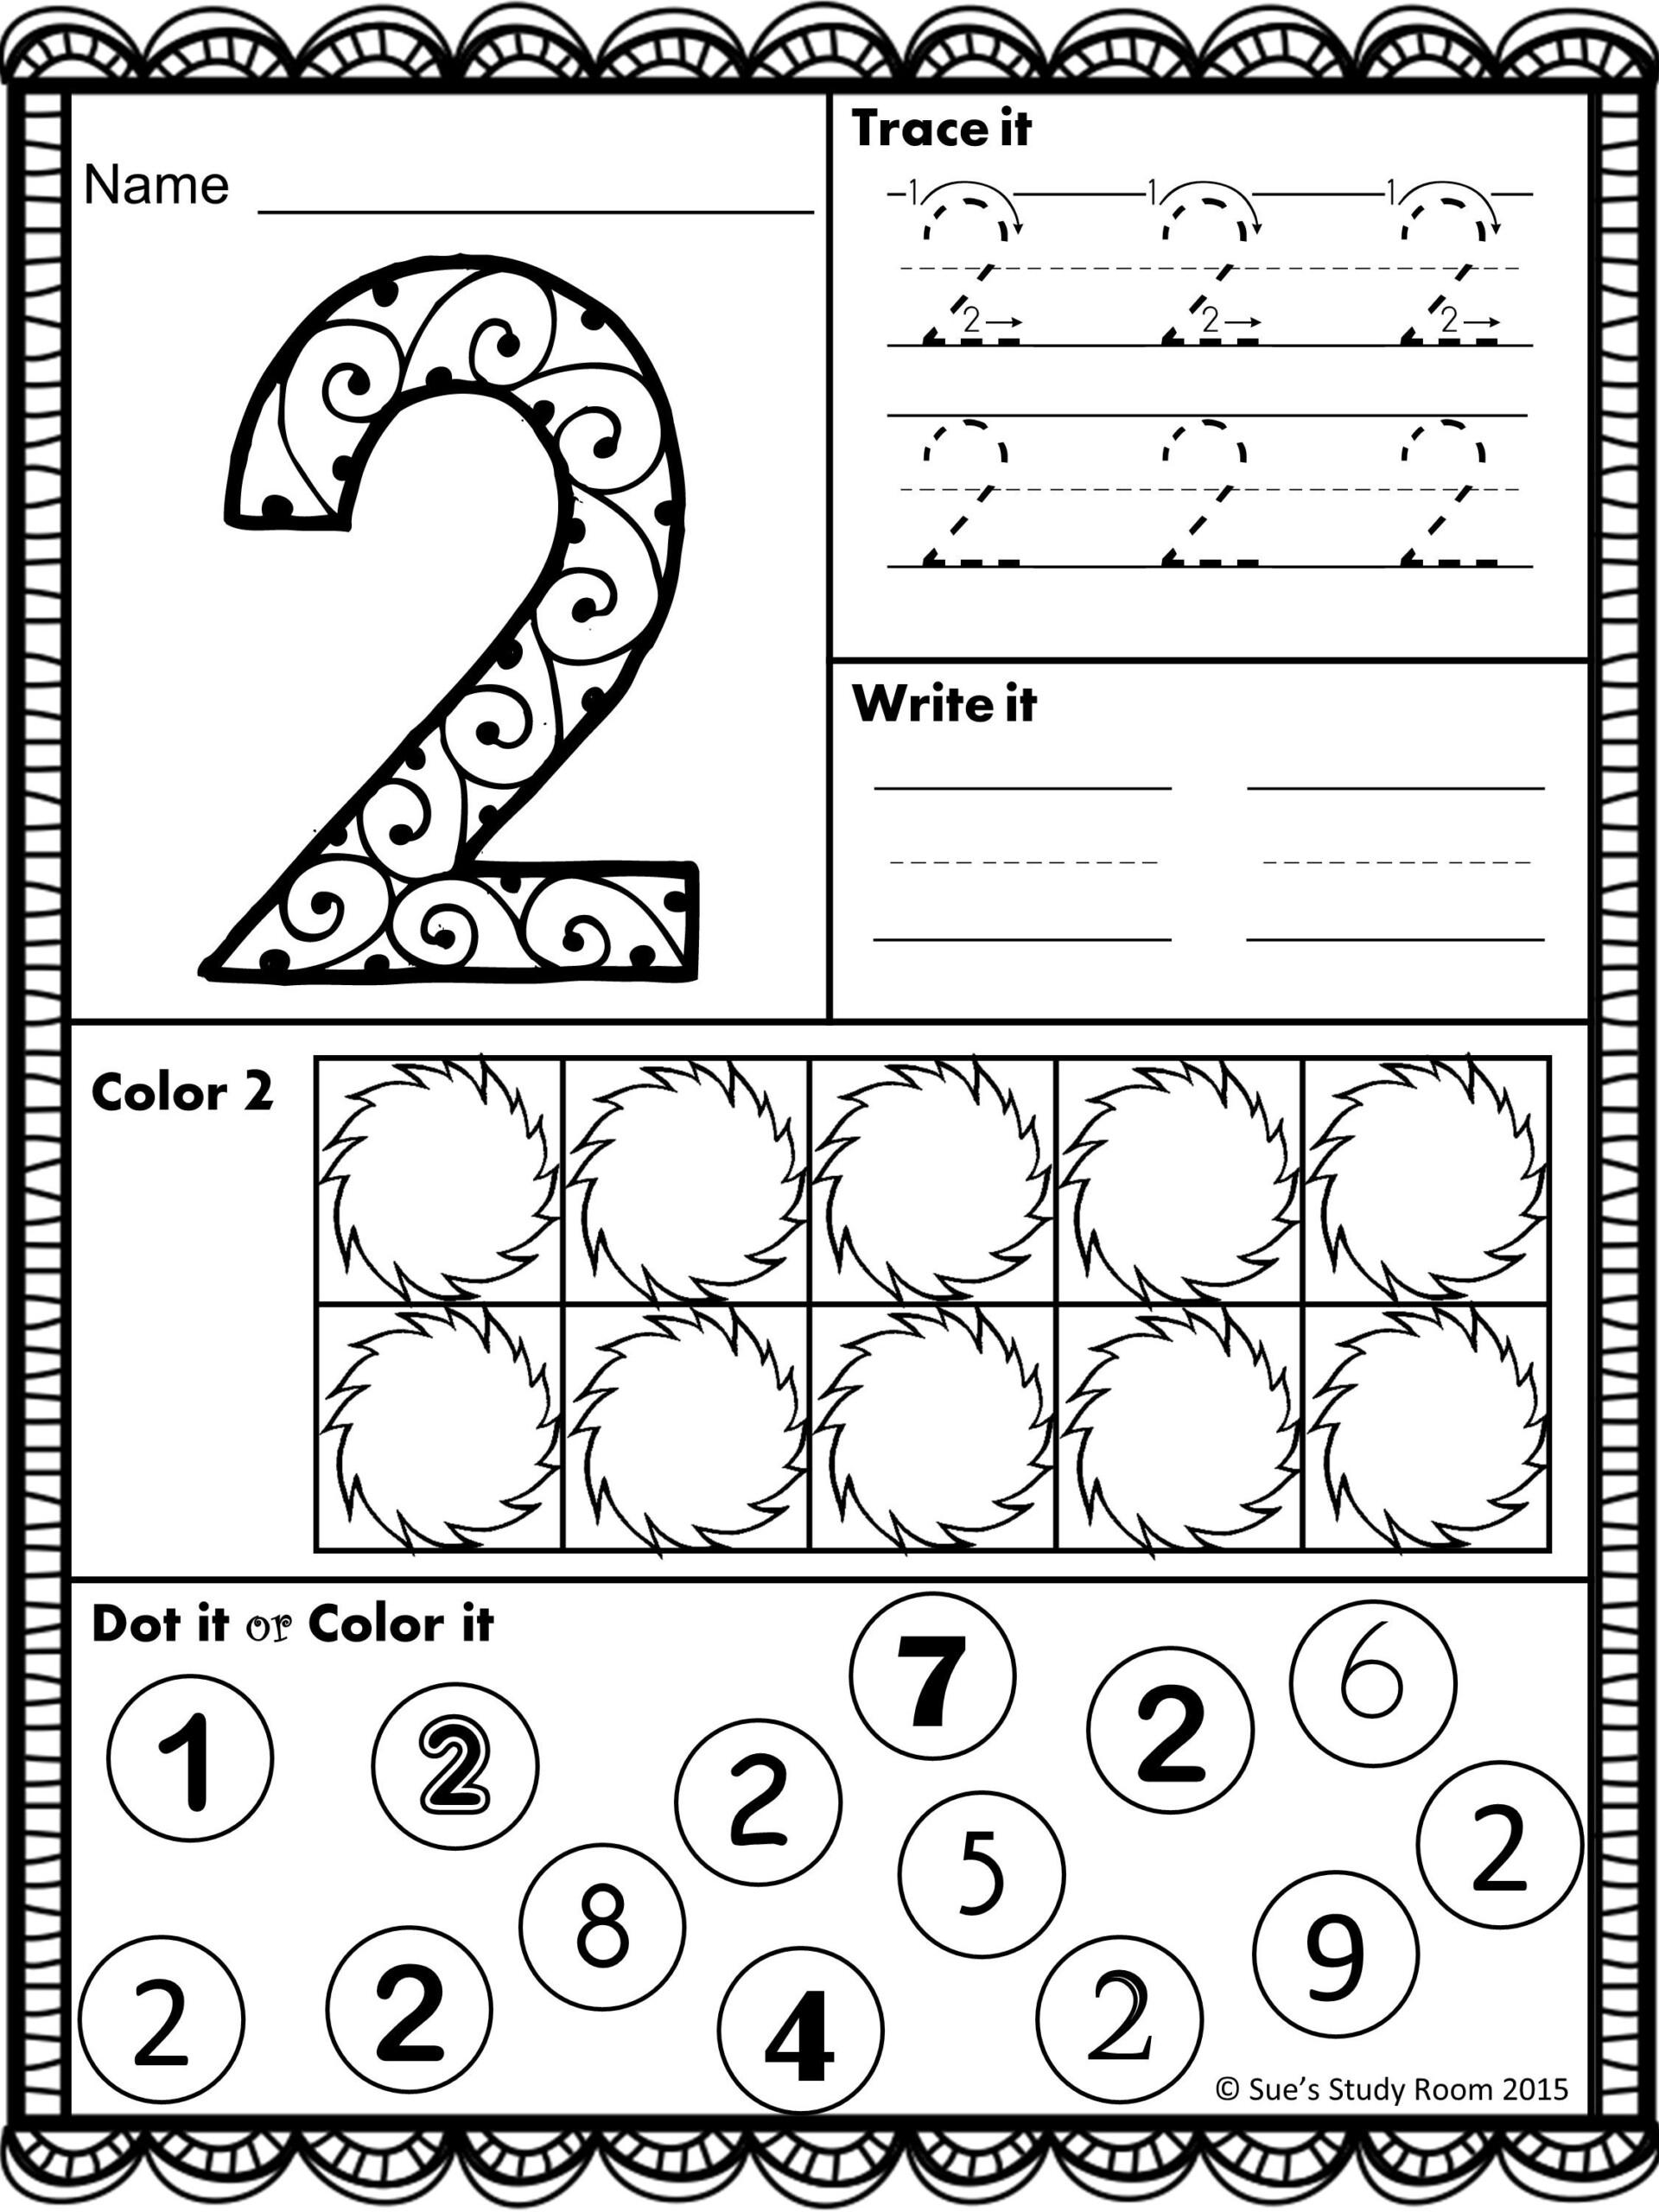 Preschool Number Recognition Worksheets NumbersWorksheet